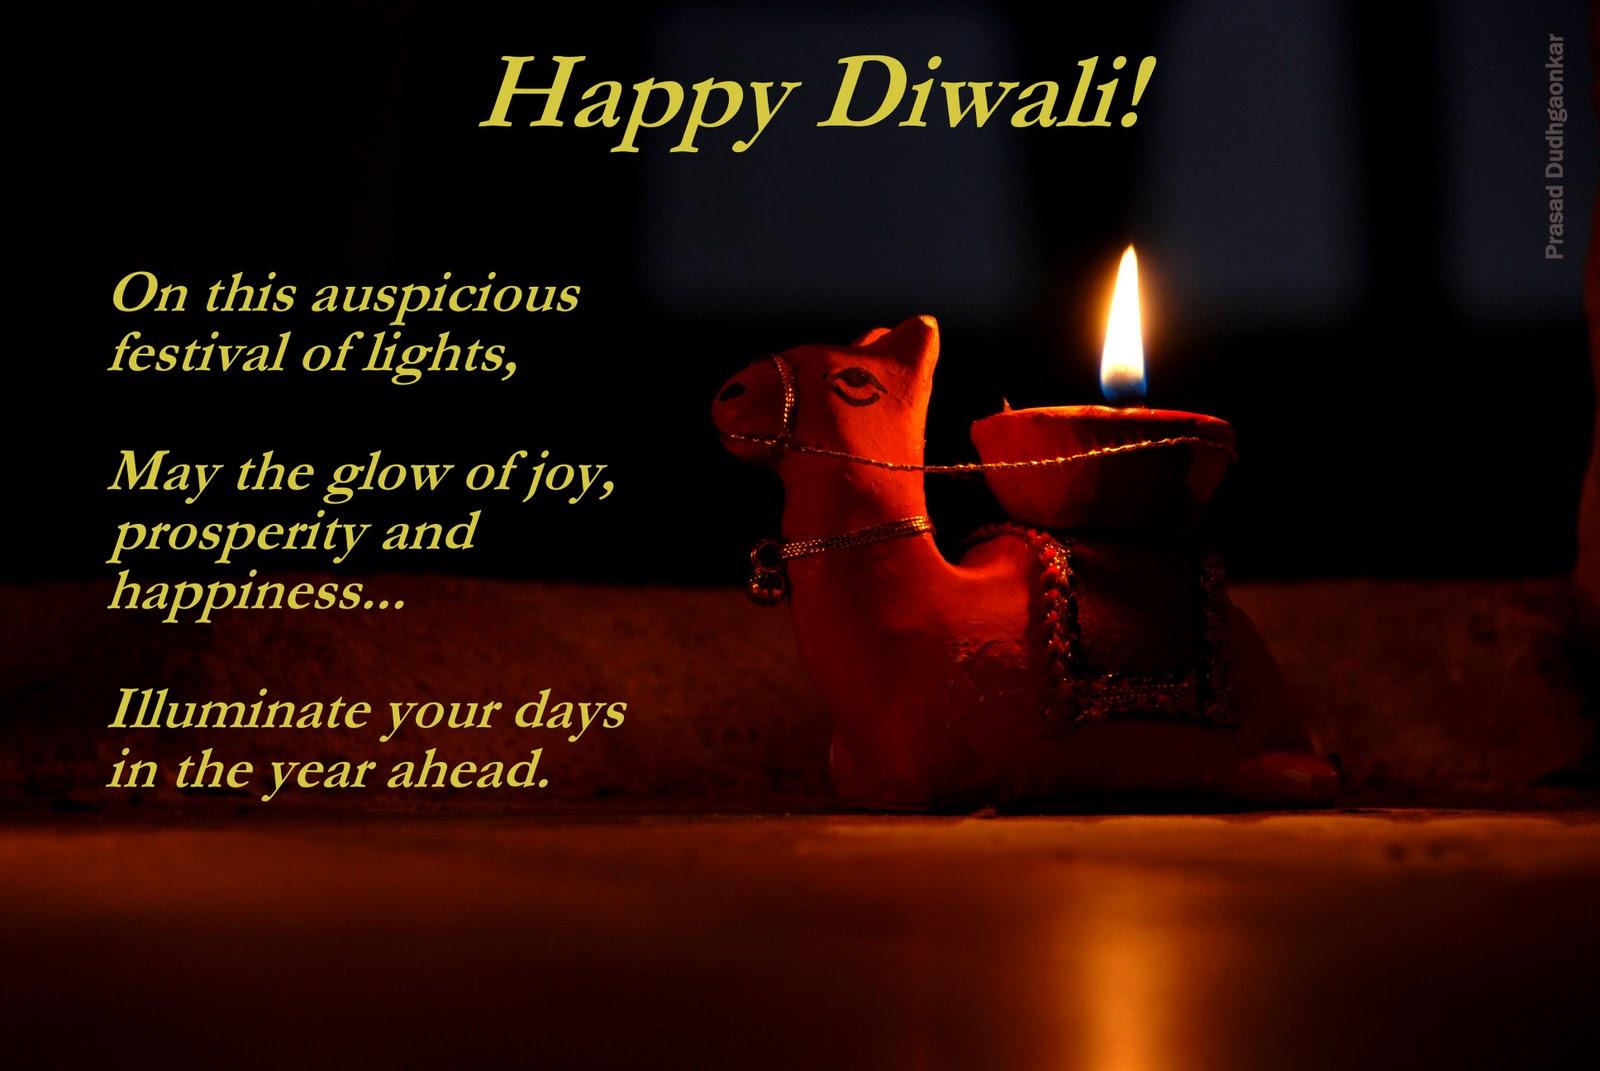 Prasads excursions downloadable diwali greeting downloadable diwali greeting m4hsunfo